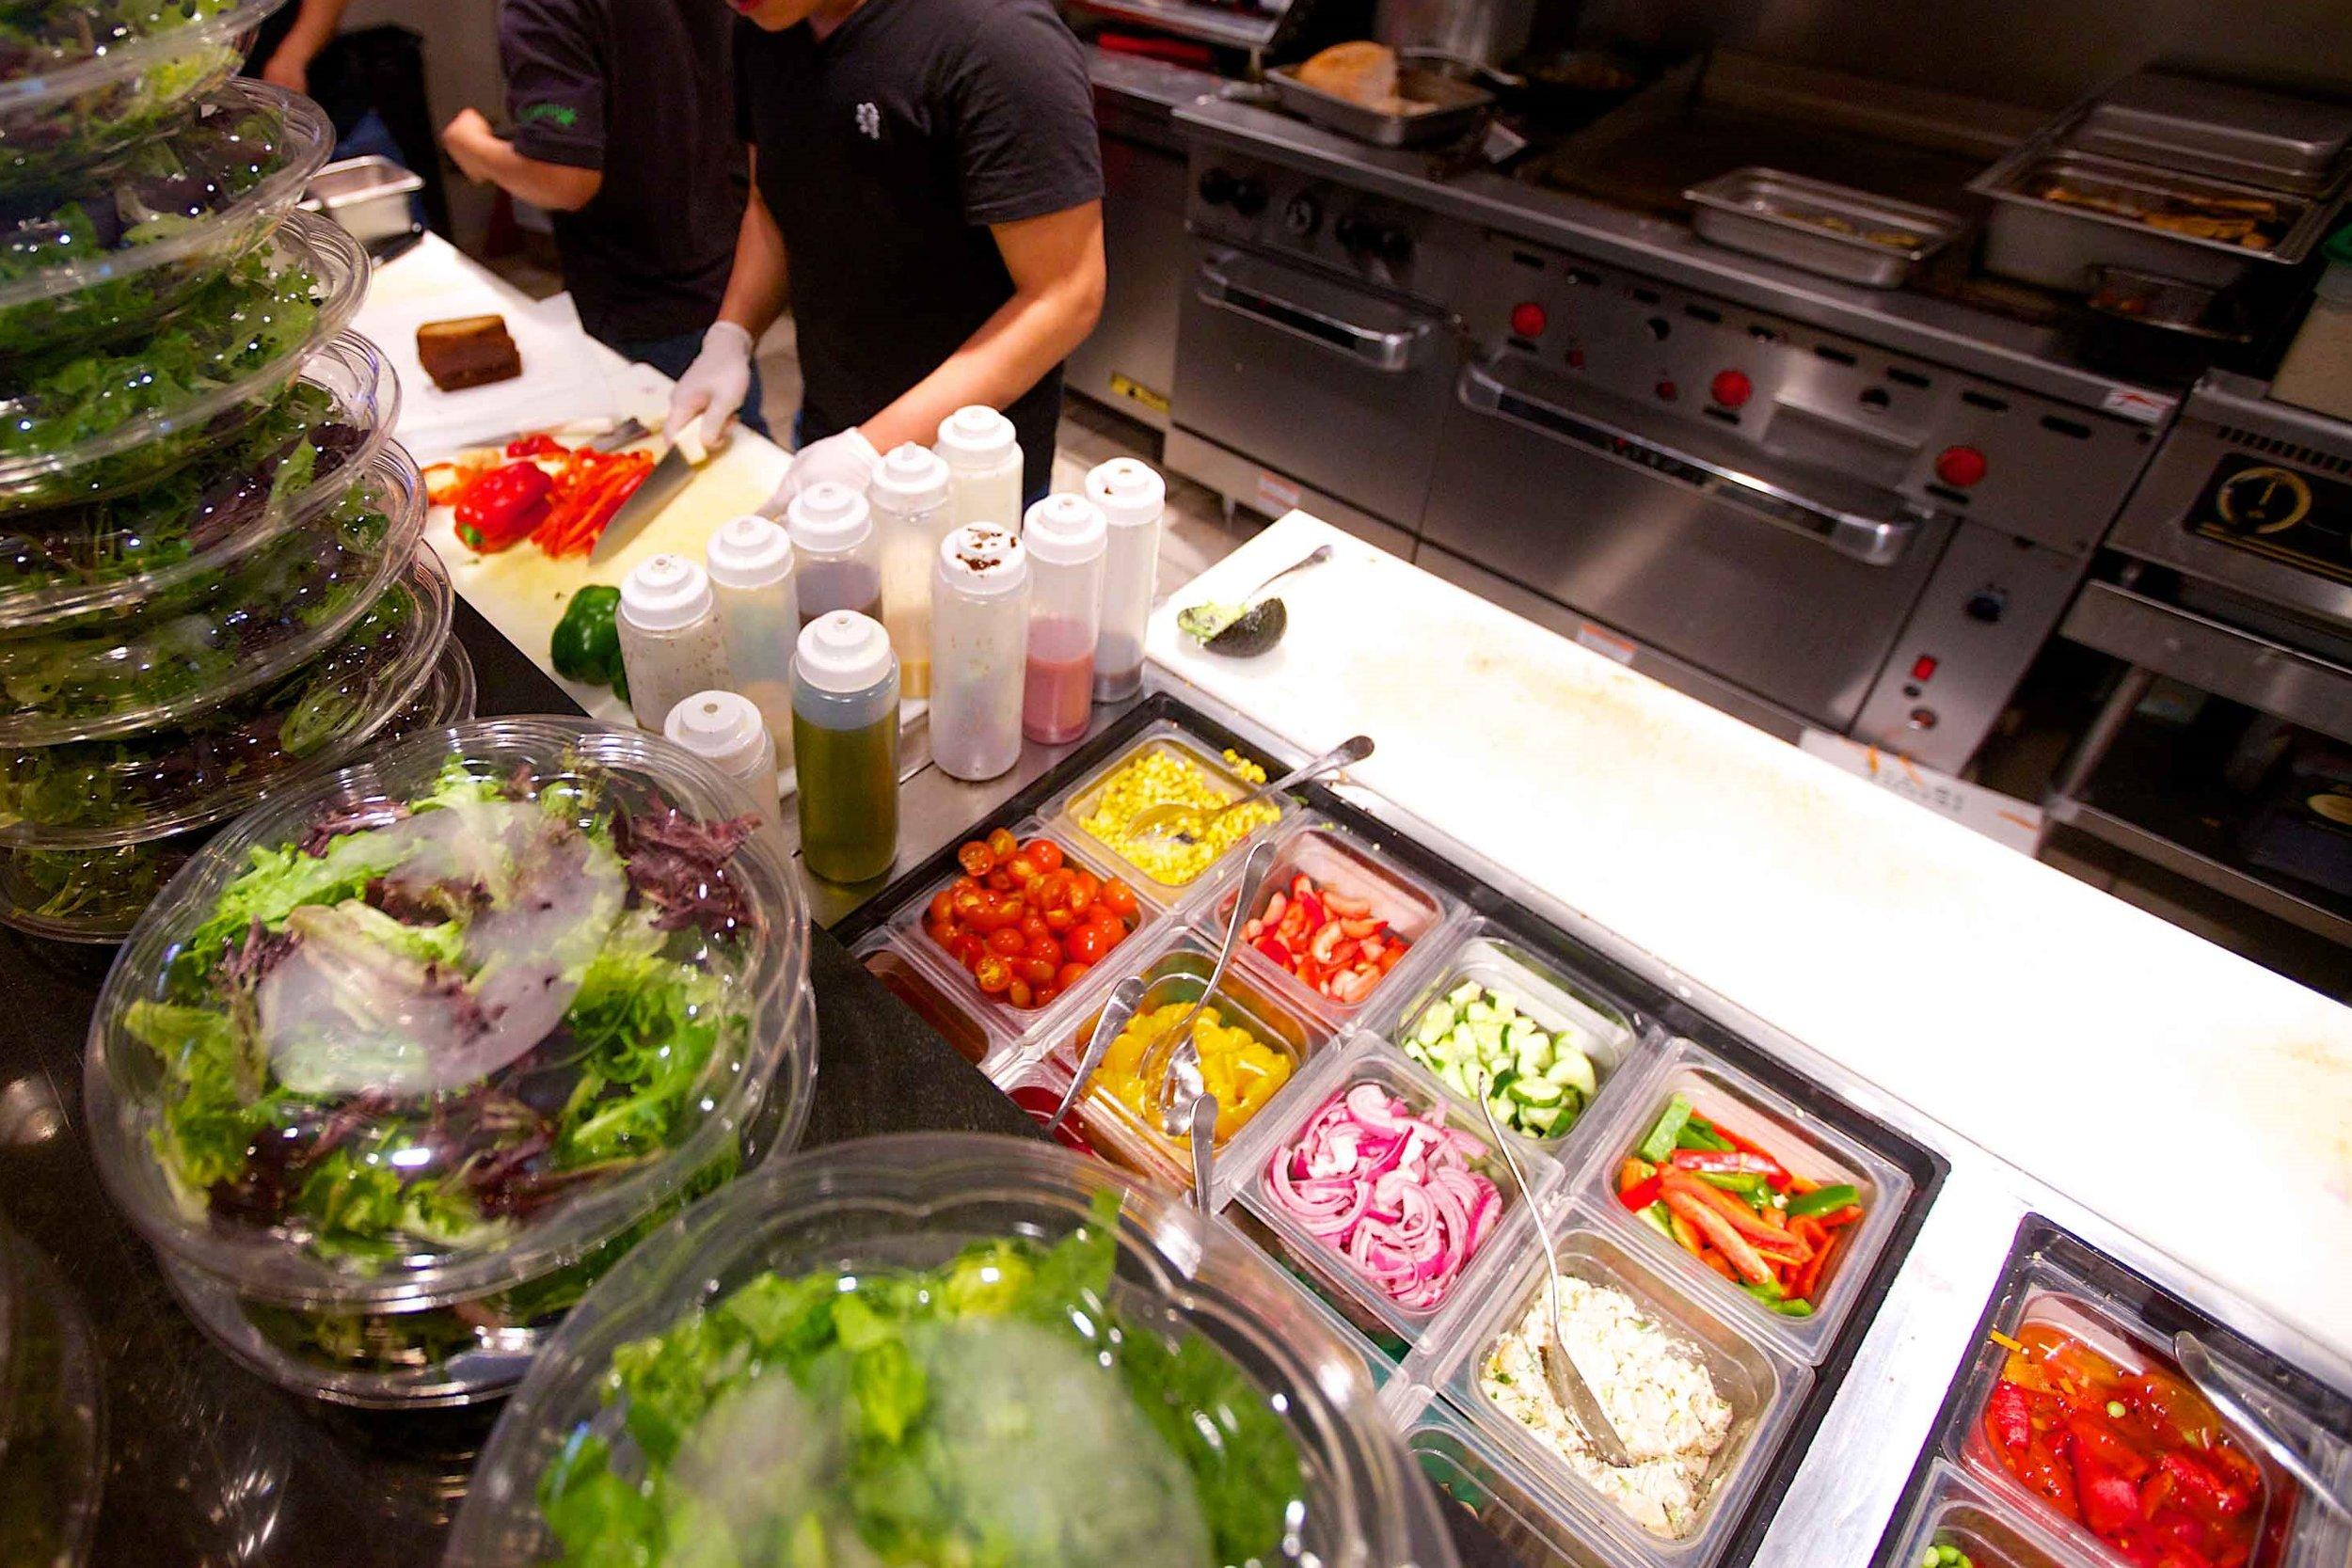 Create Your Own Salad Bar